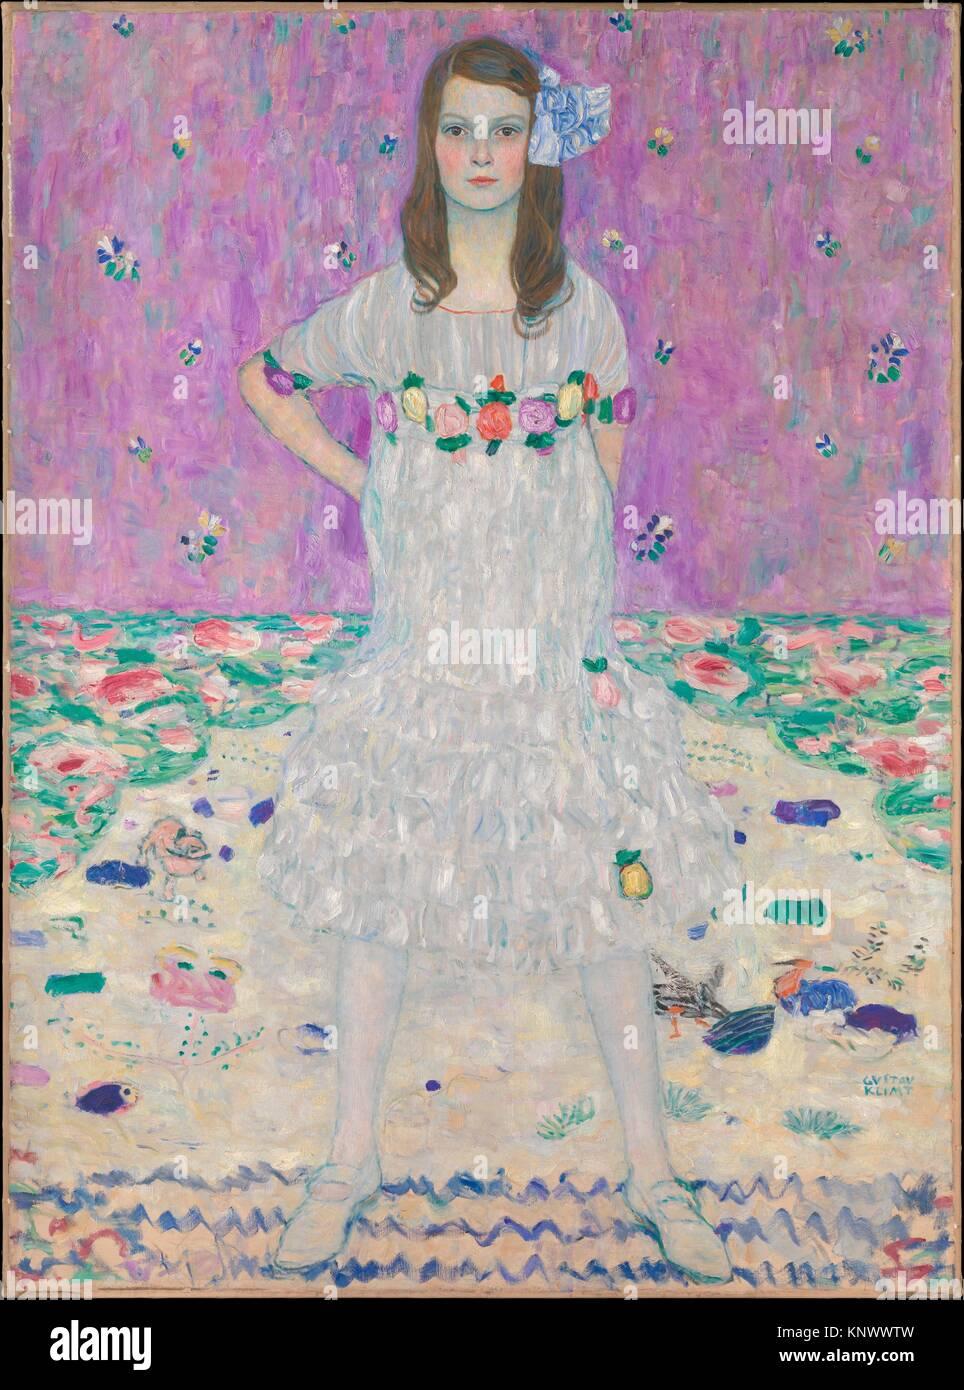 Mäda Primavesi (1903-2000). Artista: Gustav Klimt (austriaco, Baumgarten 1862-1918 Vienna); data: 1912-13; medie: Olio su tela; Dimensioni: 59 x 43 Foto Stock